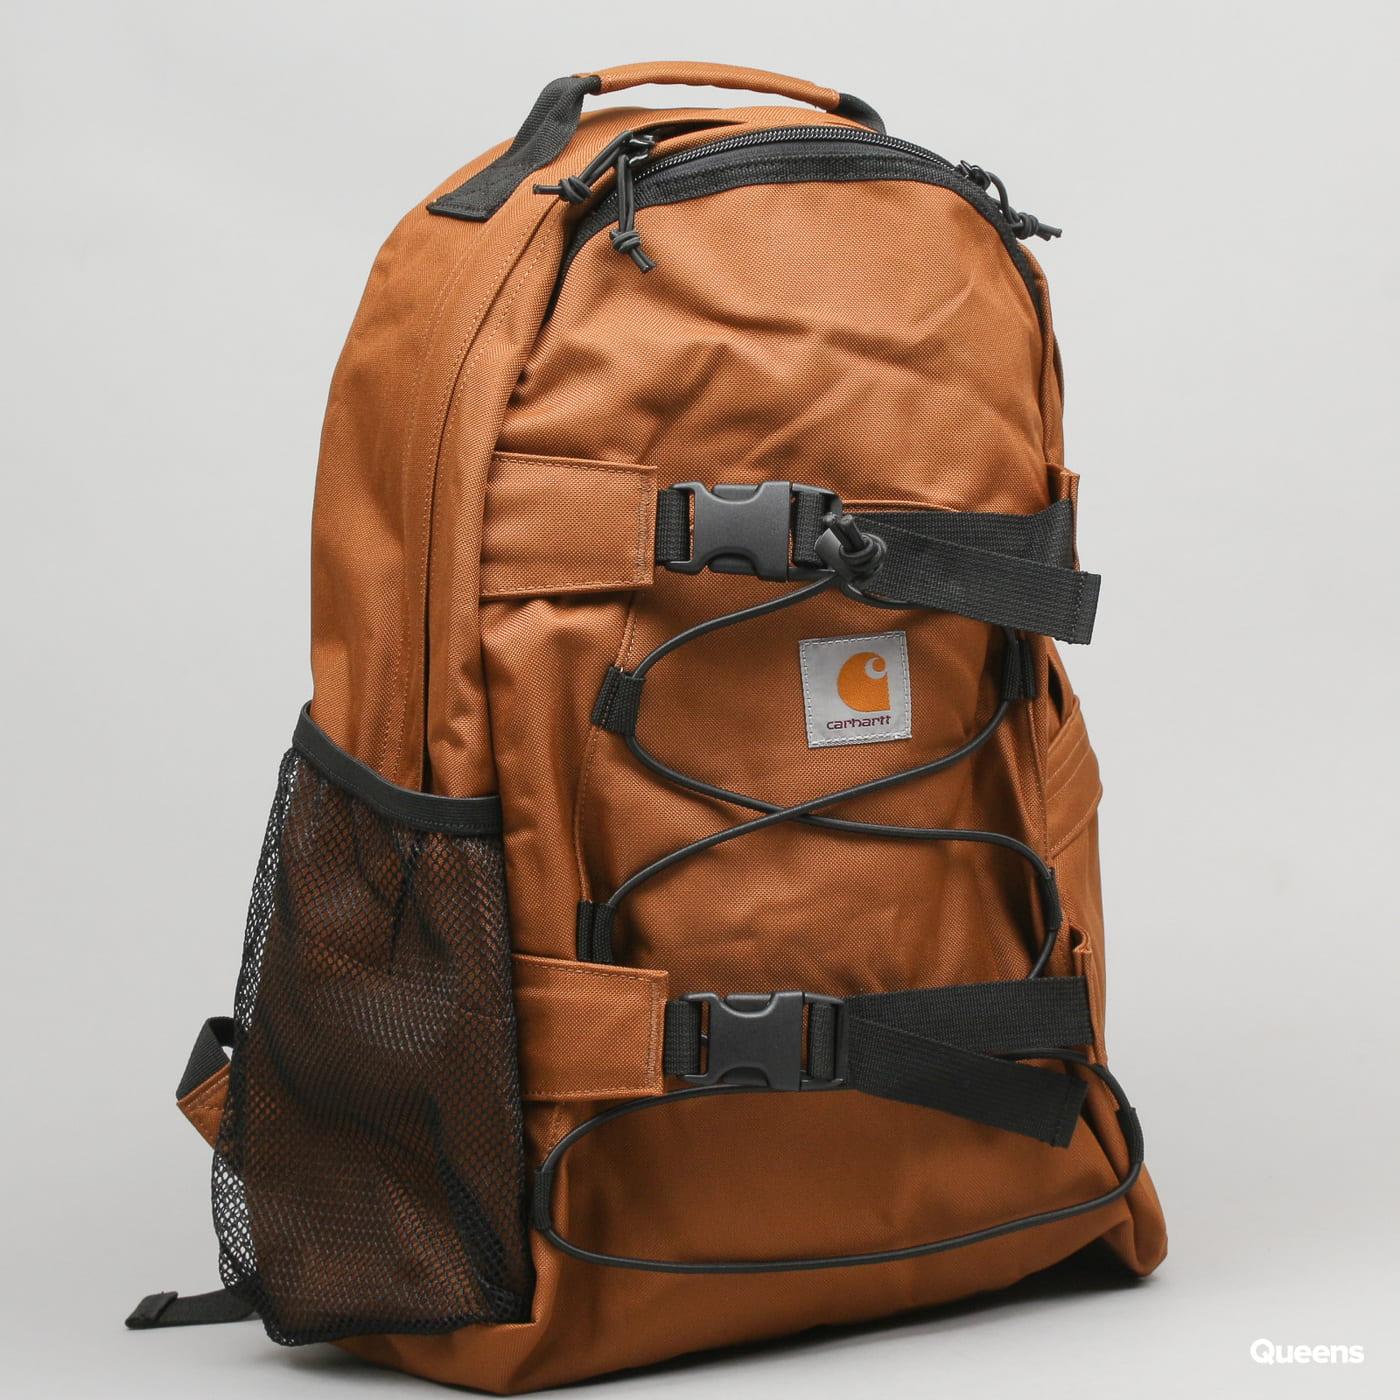 Carhartt WIP Kickflip Backpack braun / schwarz